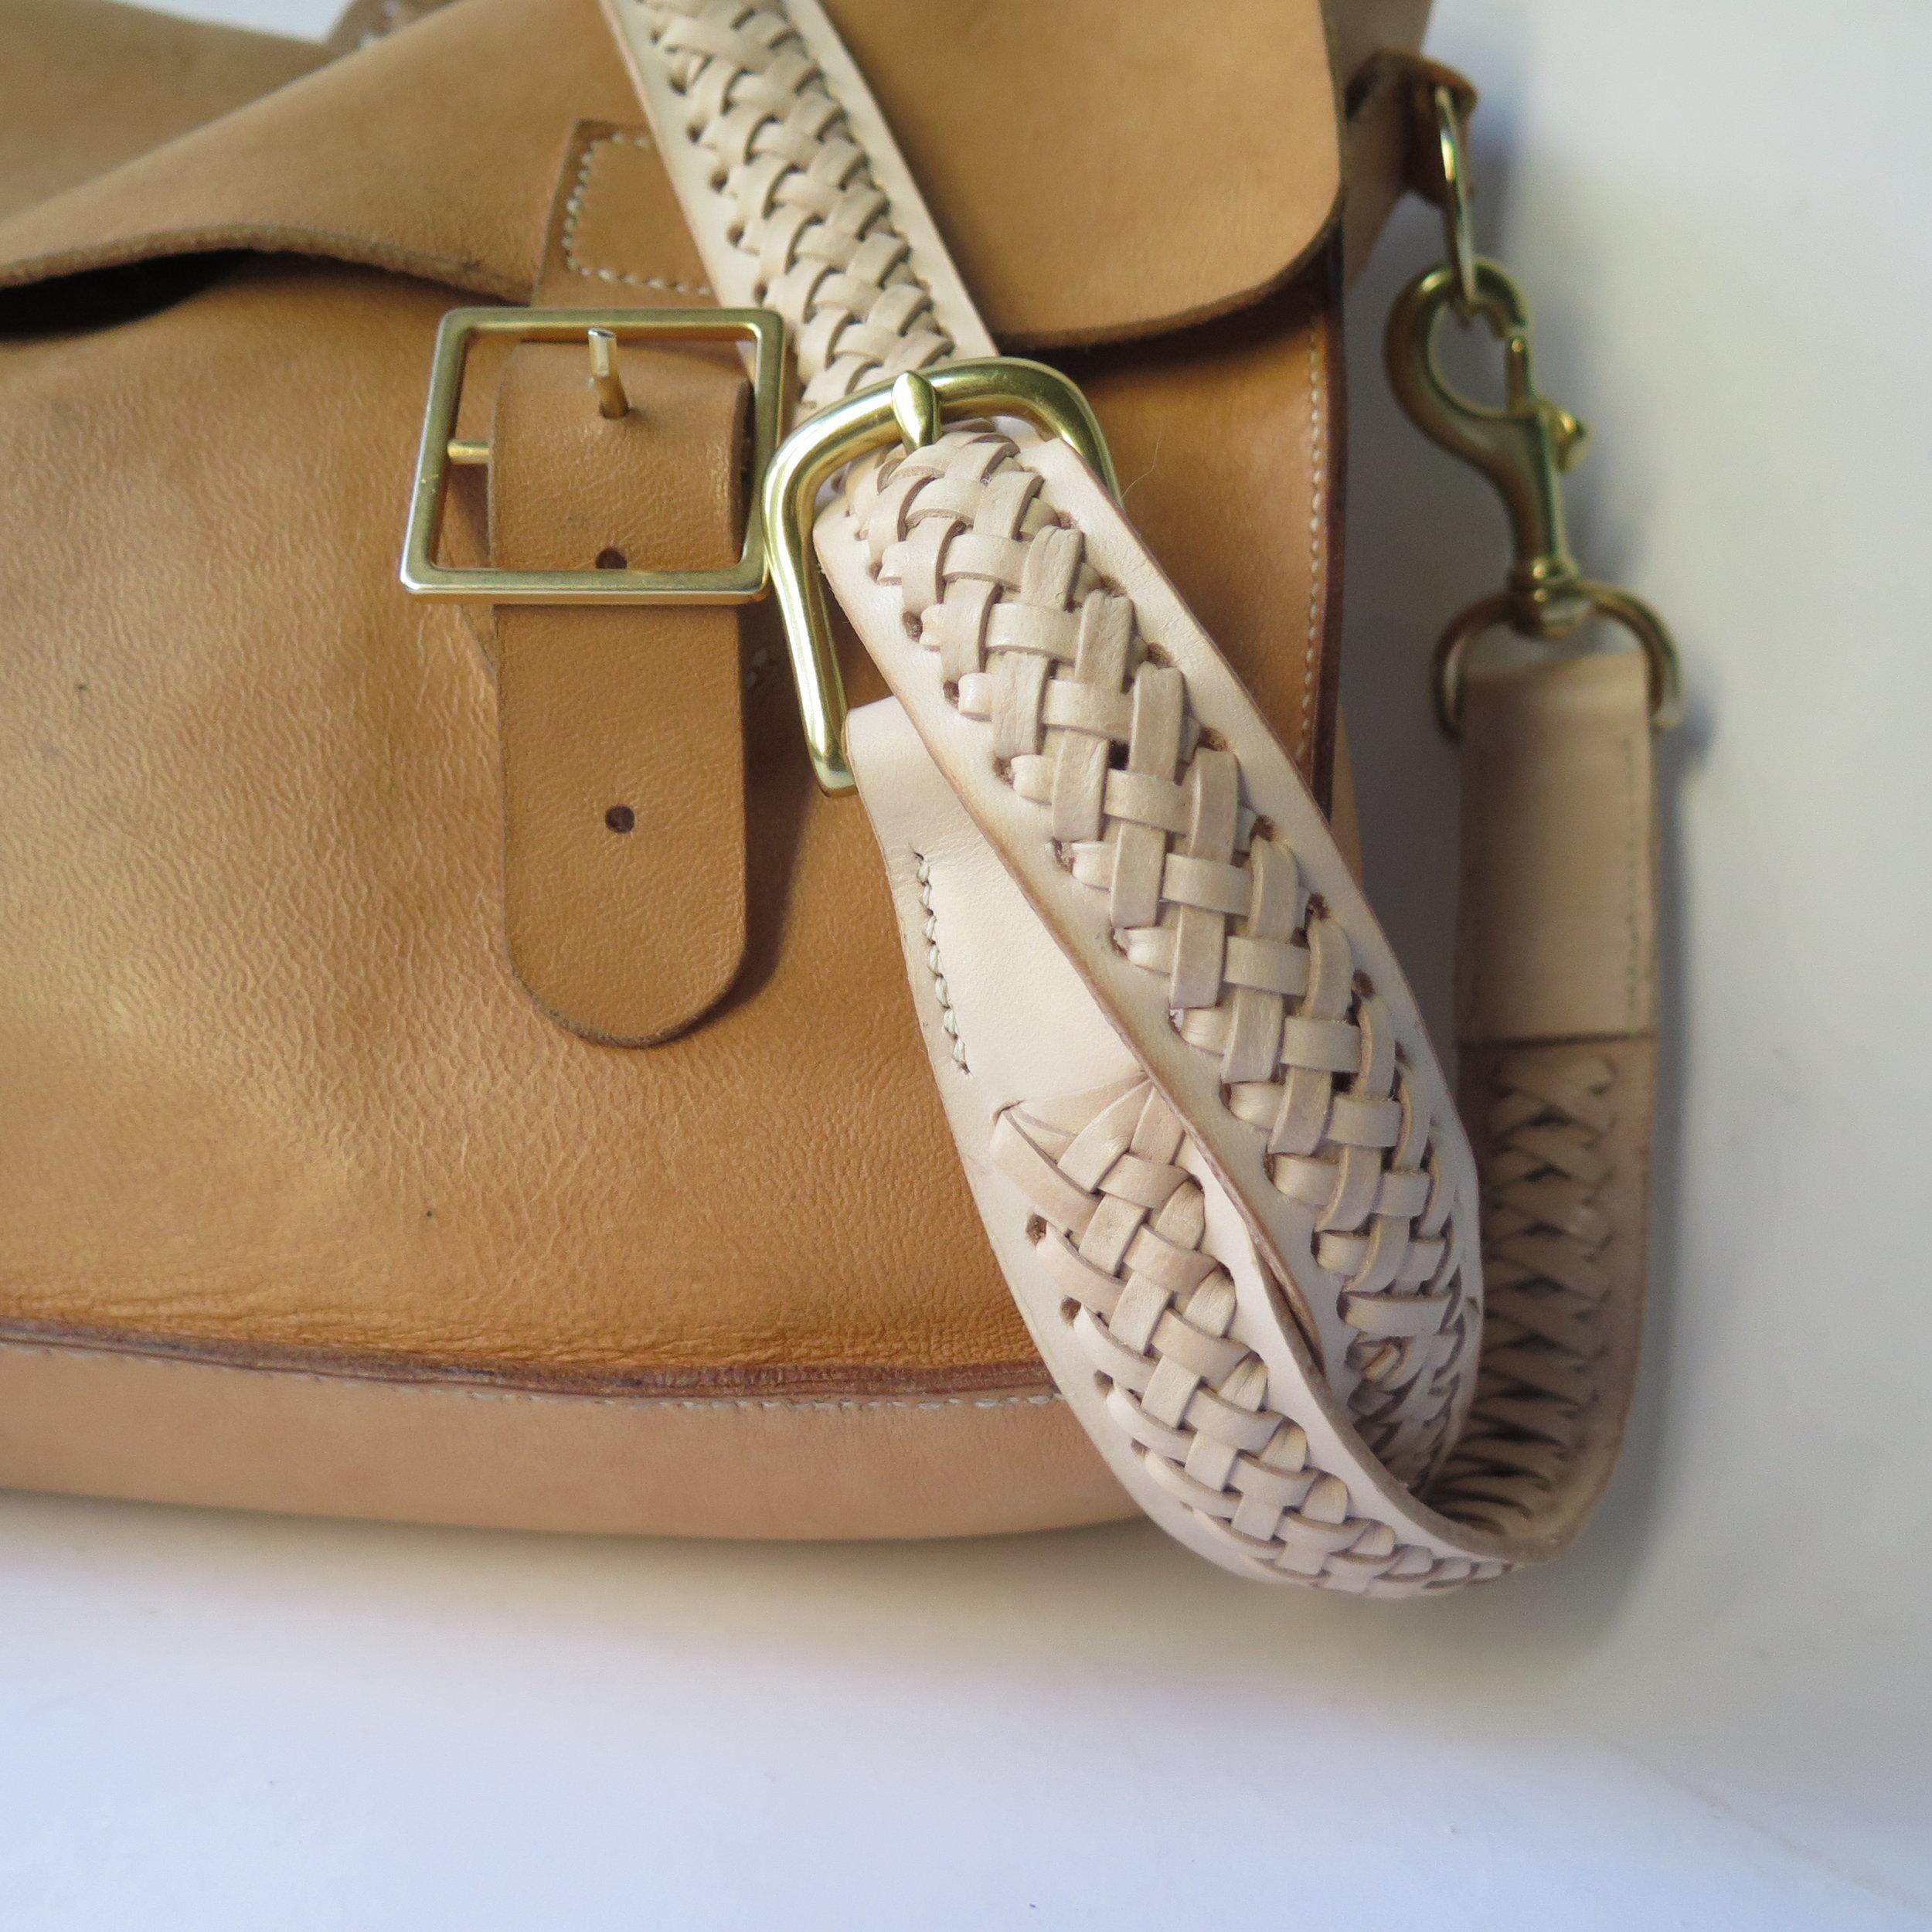 Mary-Savel-Bucky-Bag-Leather-handbag-saddle-stitch.5.JPG